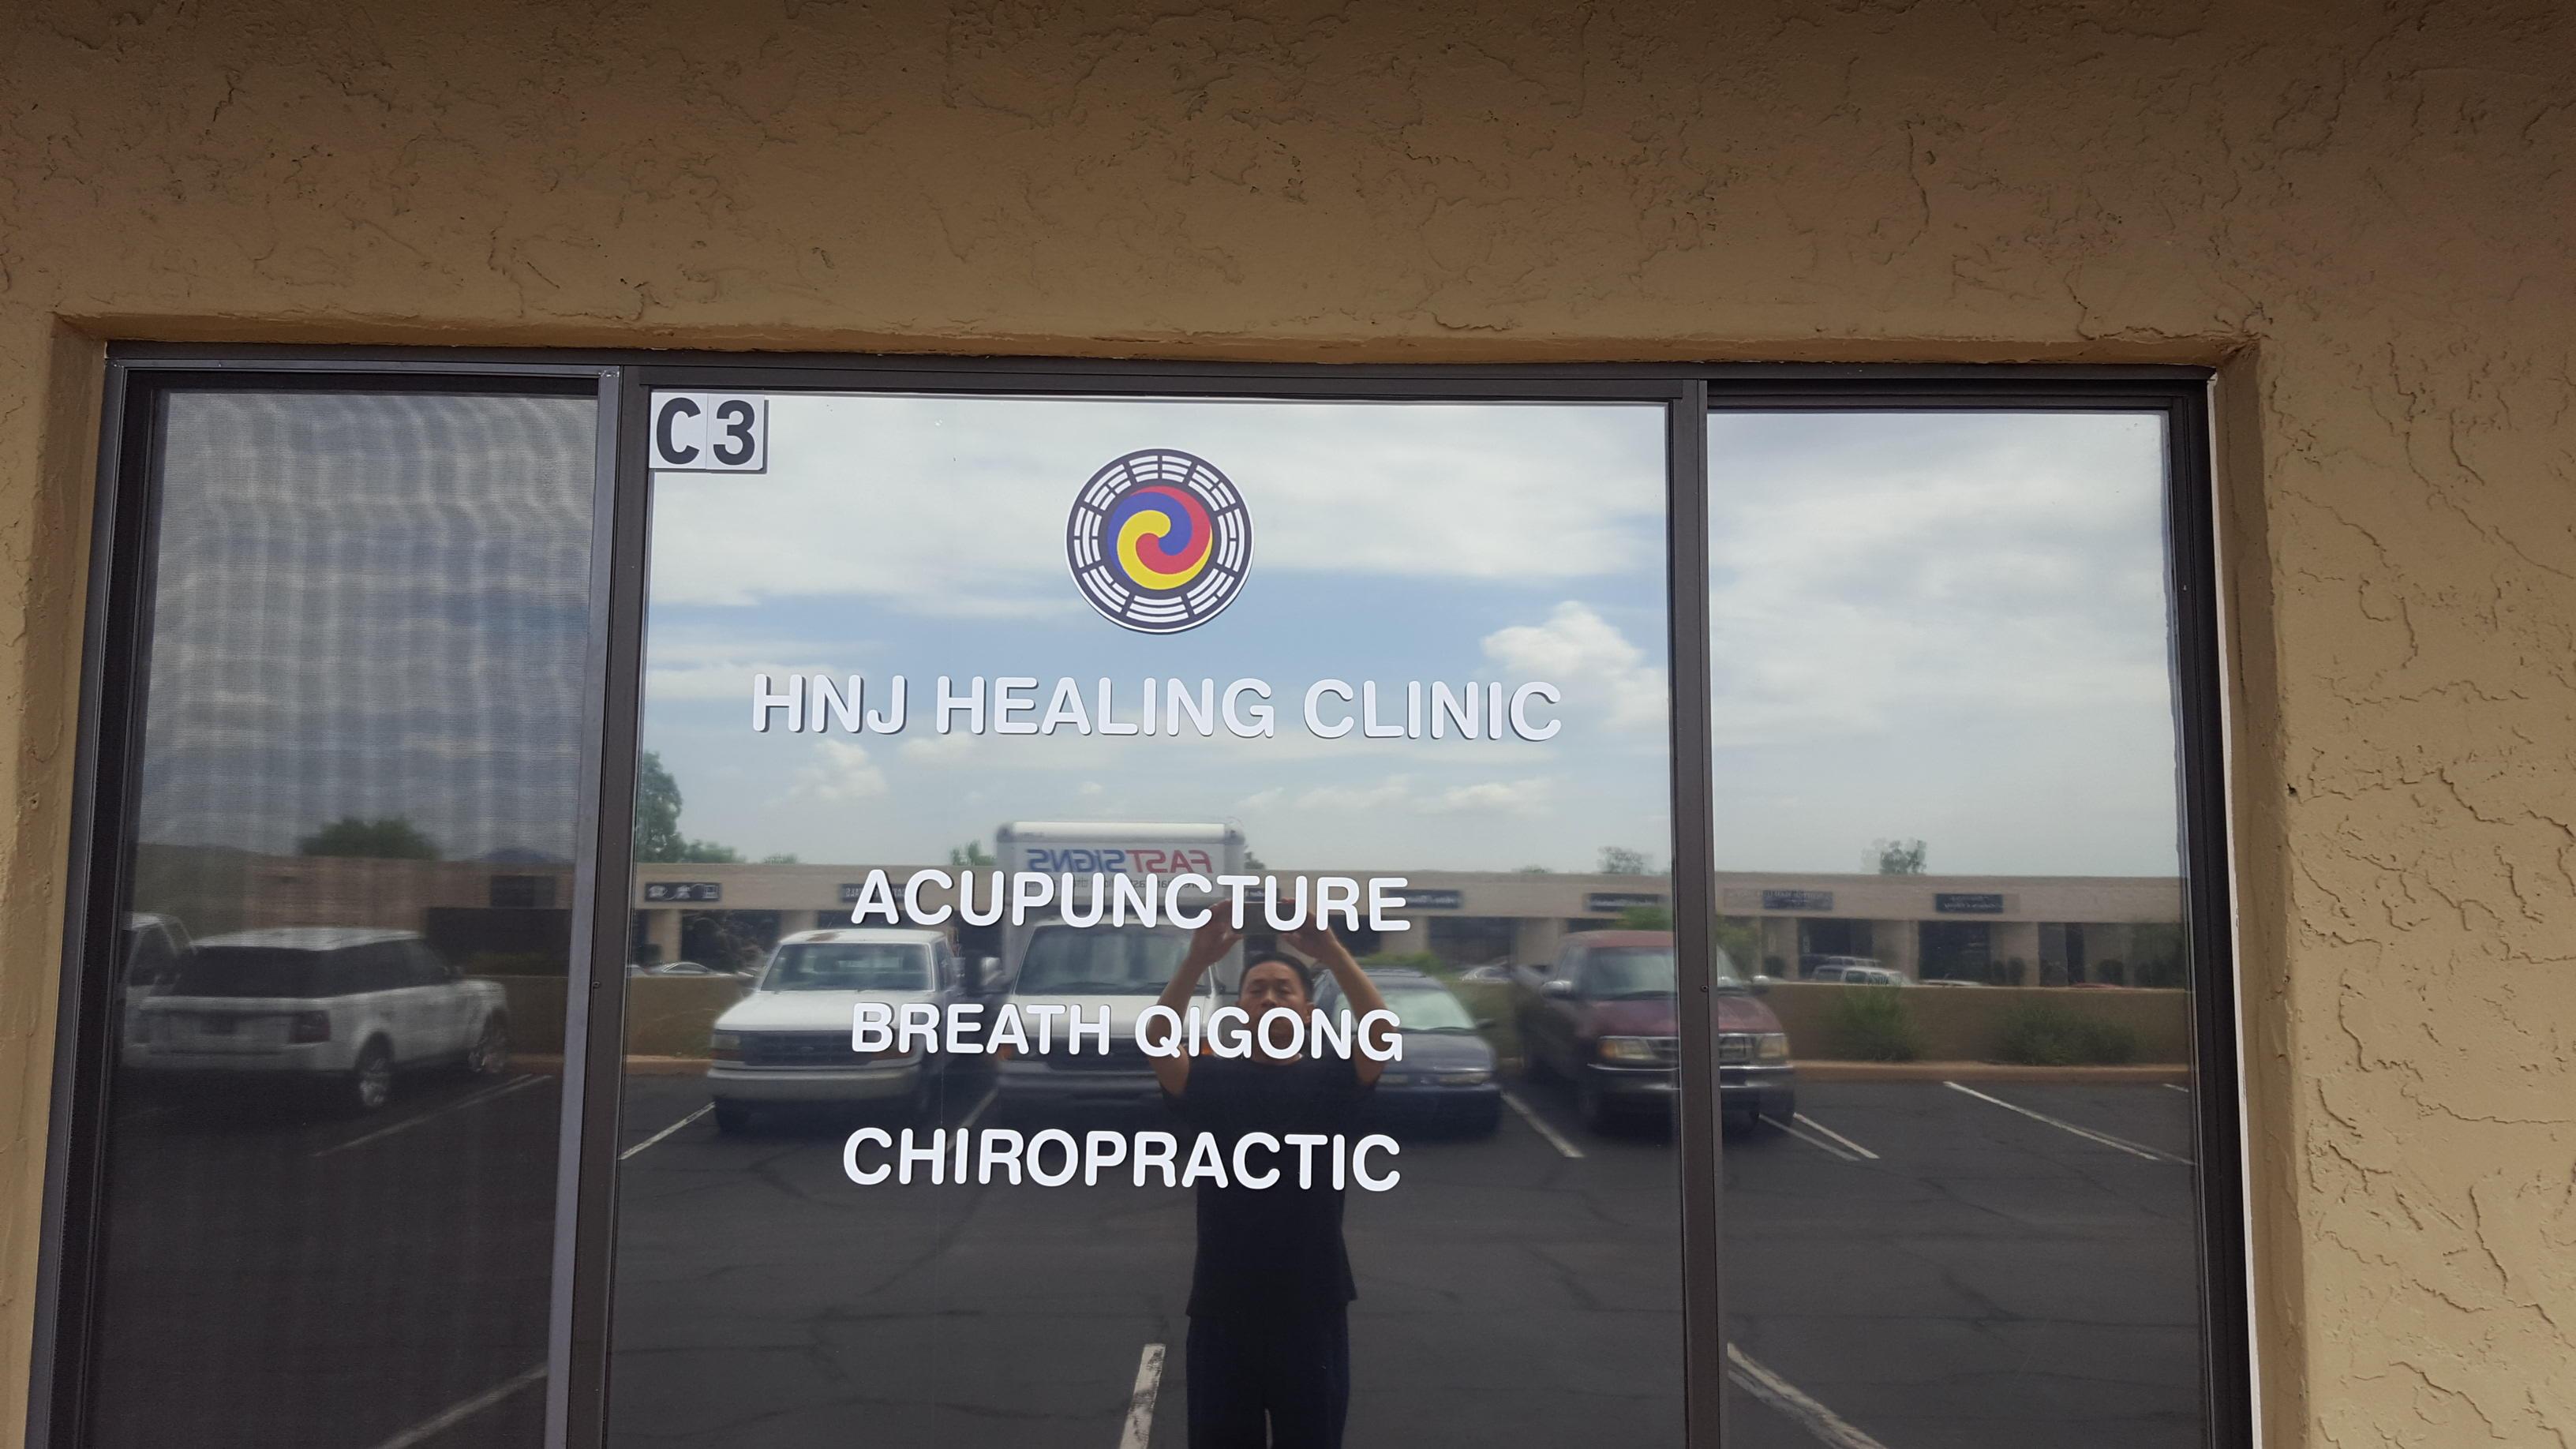 HNJ Healing Clinic image 51